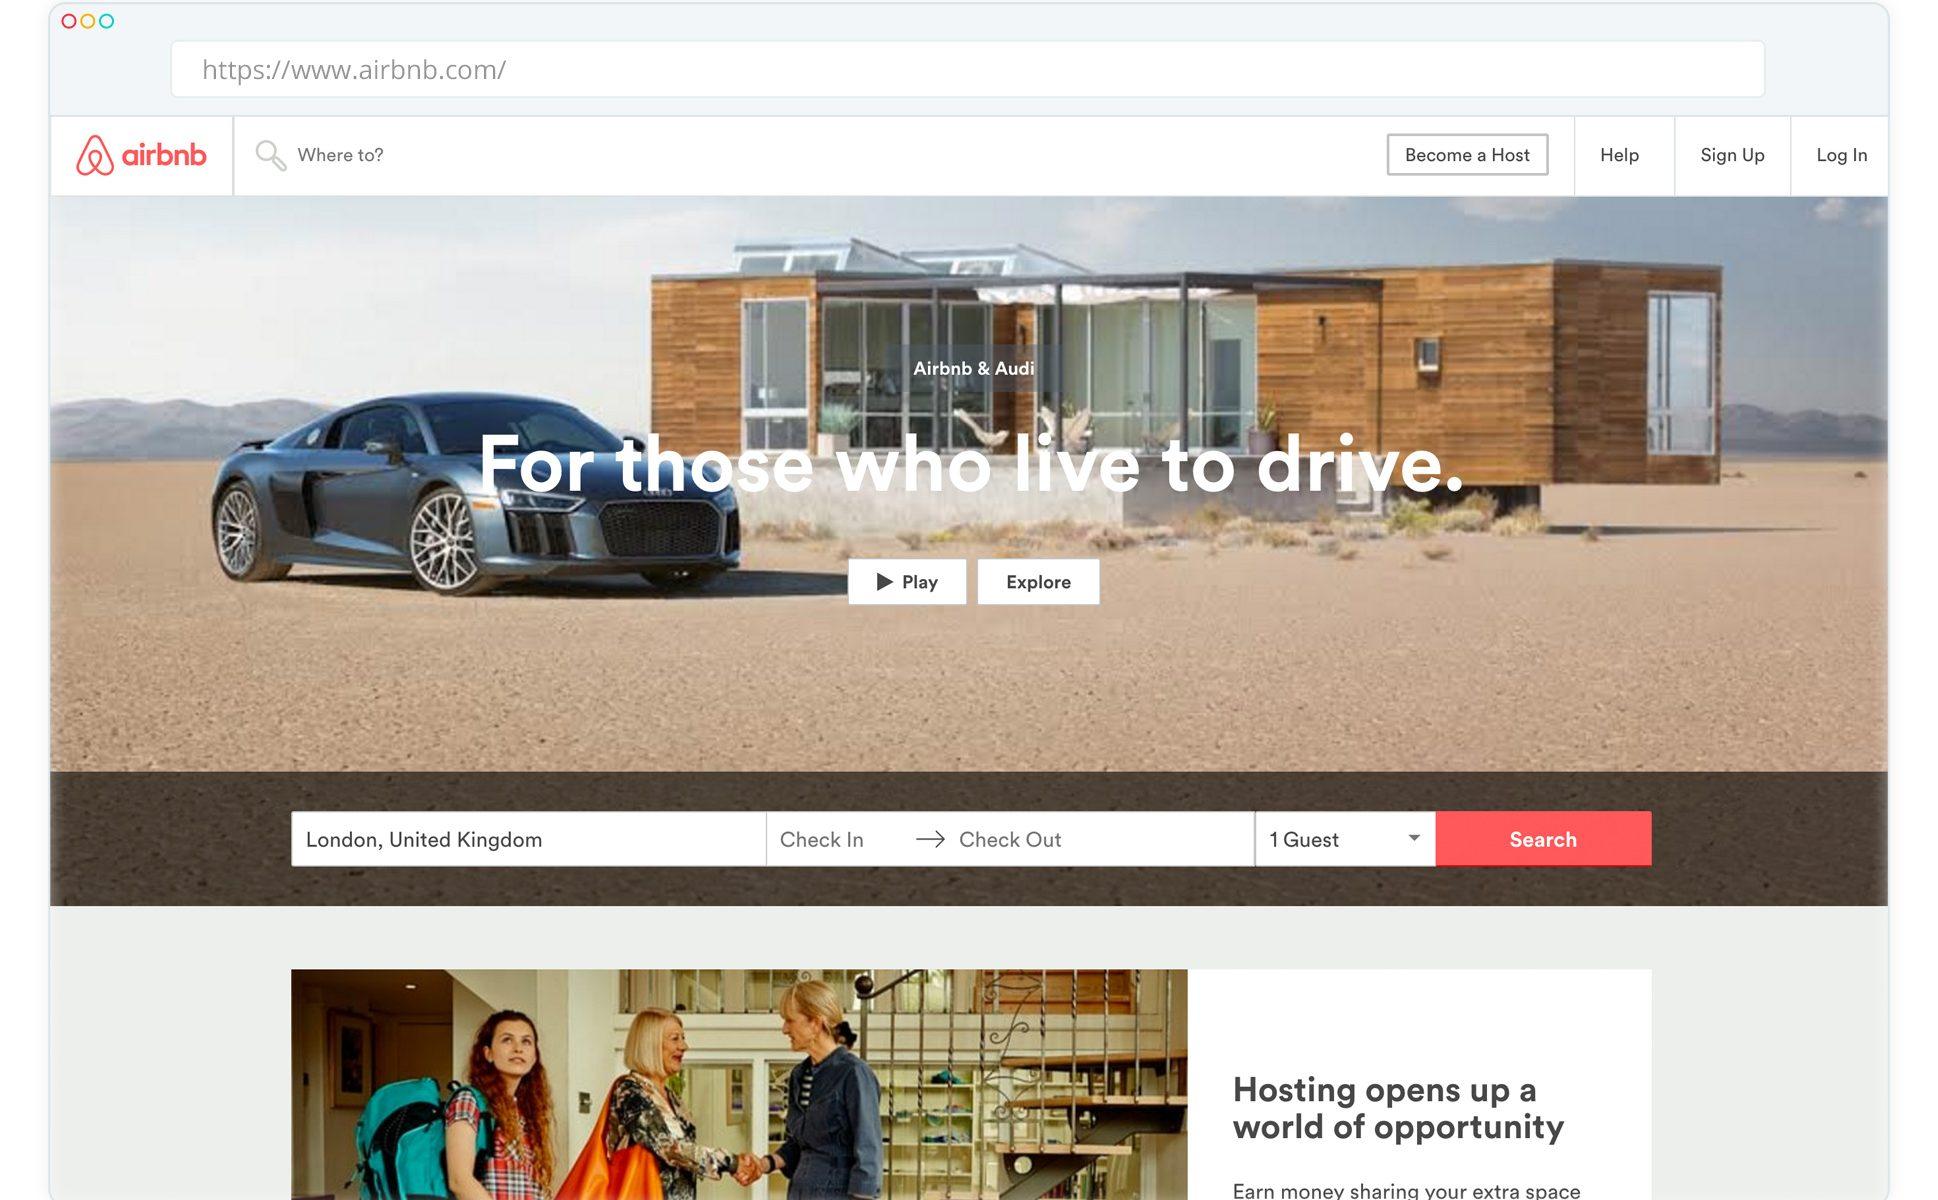 airbnb-1938x1200